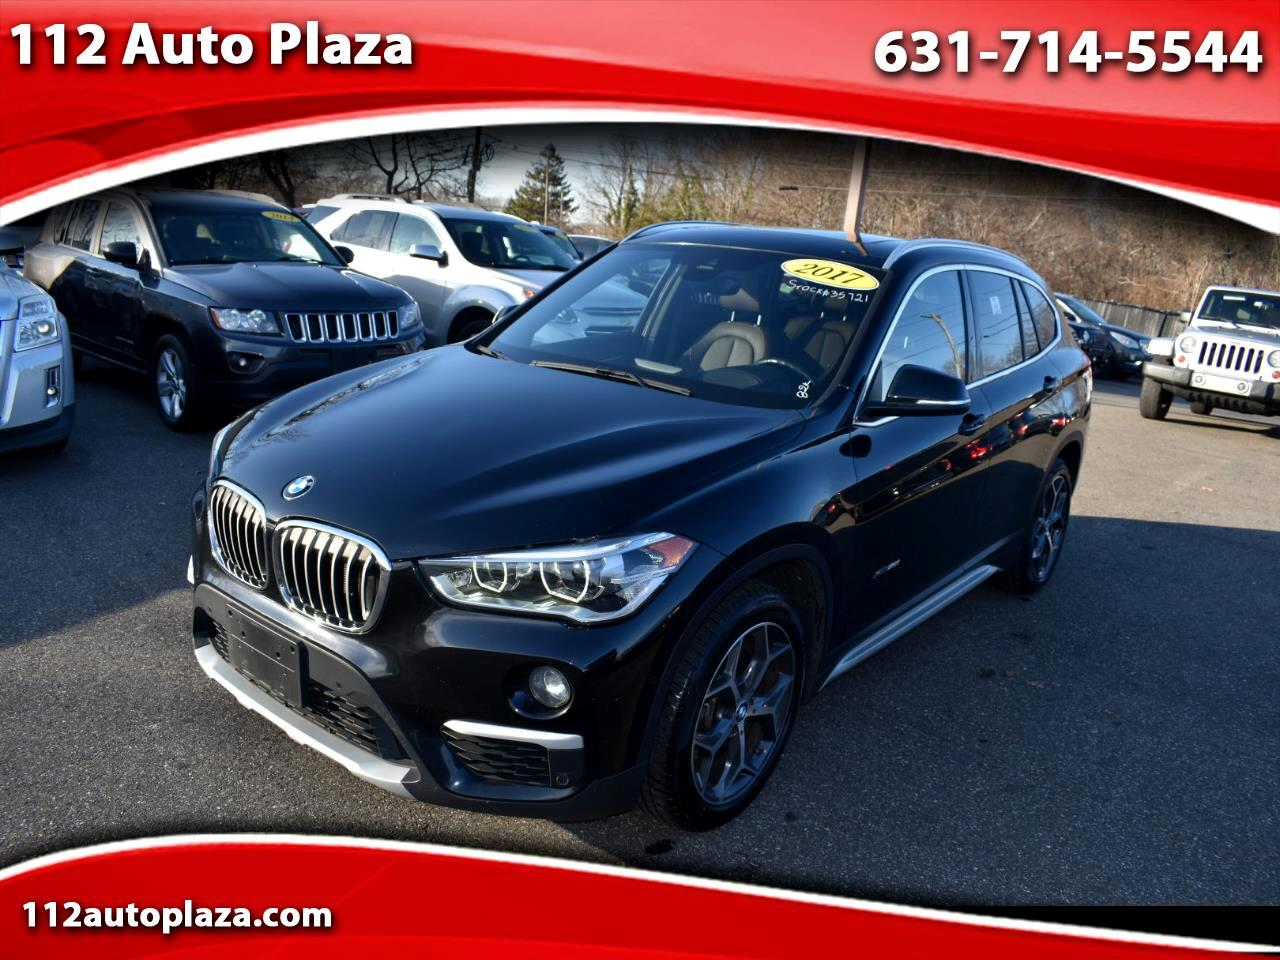 BMW X1 xDrive28i Sports Activity Vehicle Brazil 2017